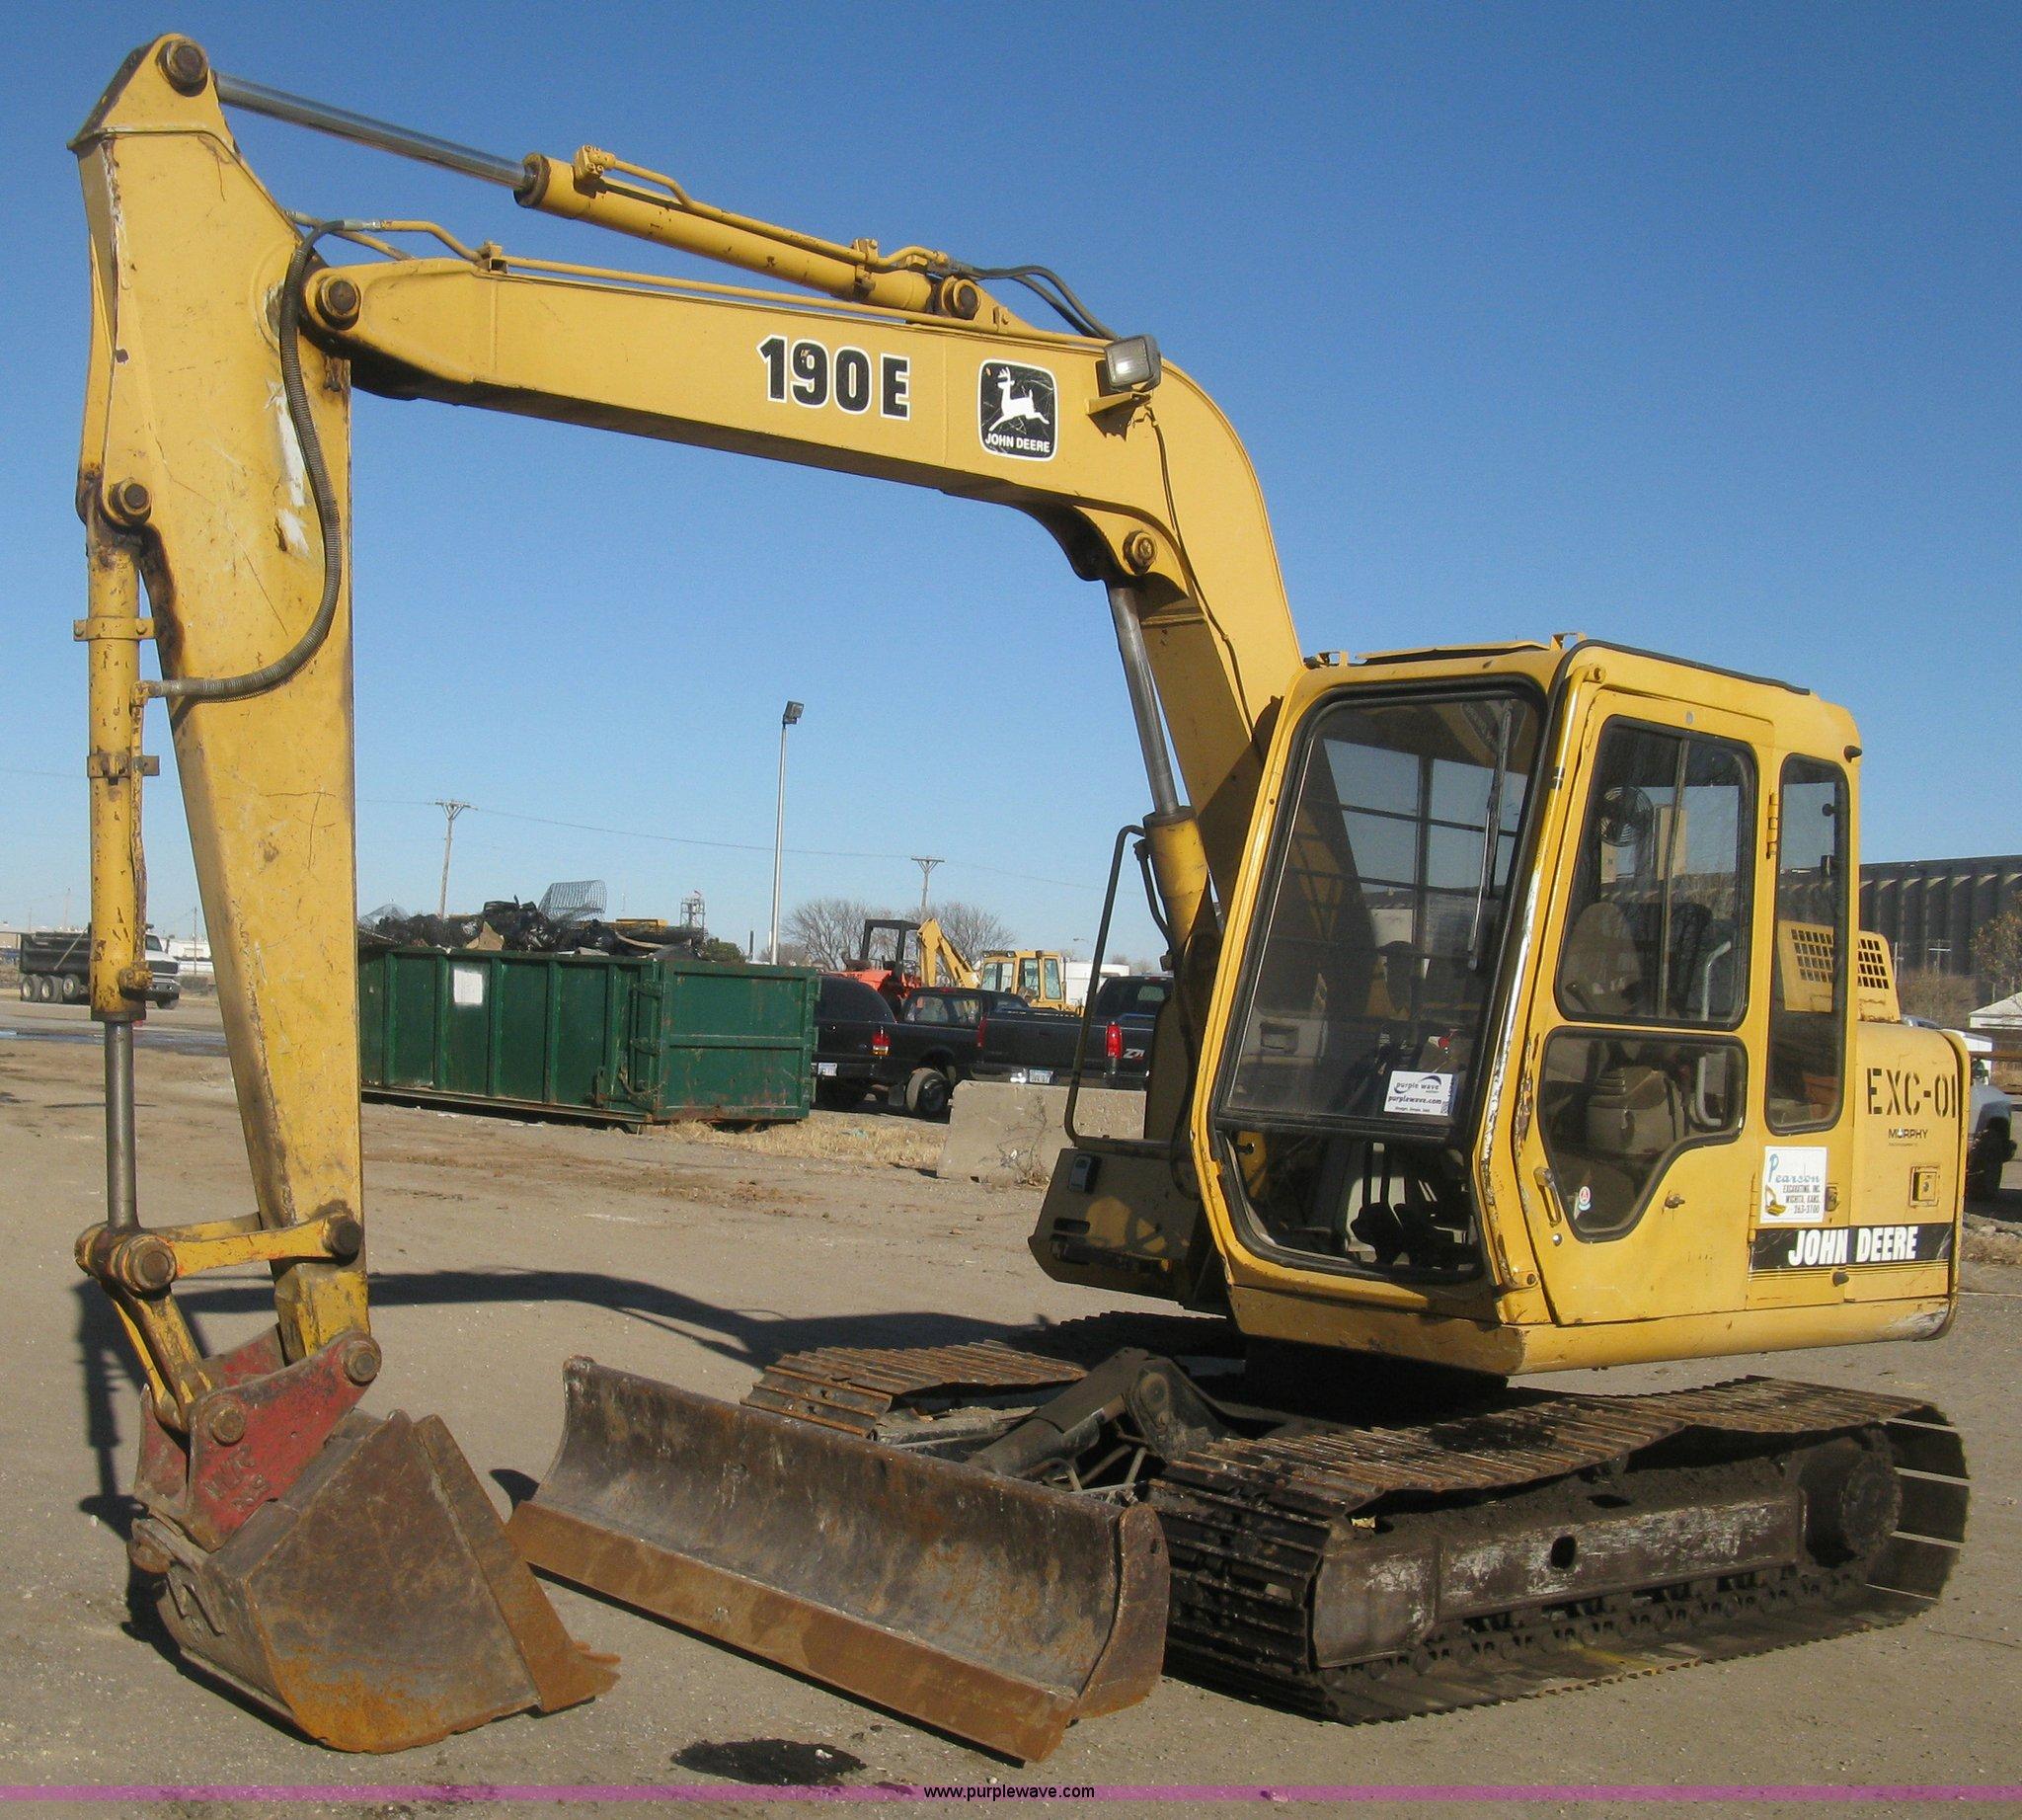 I5745 image for item I5745 1995 John Deere 190E excavator